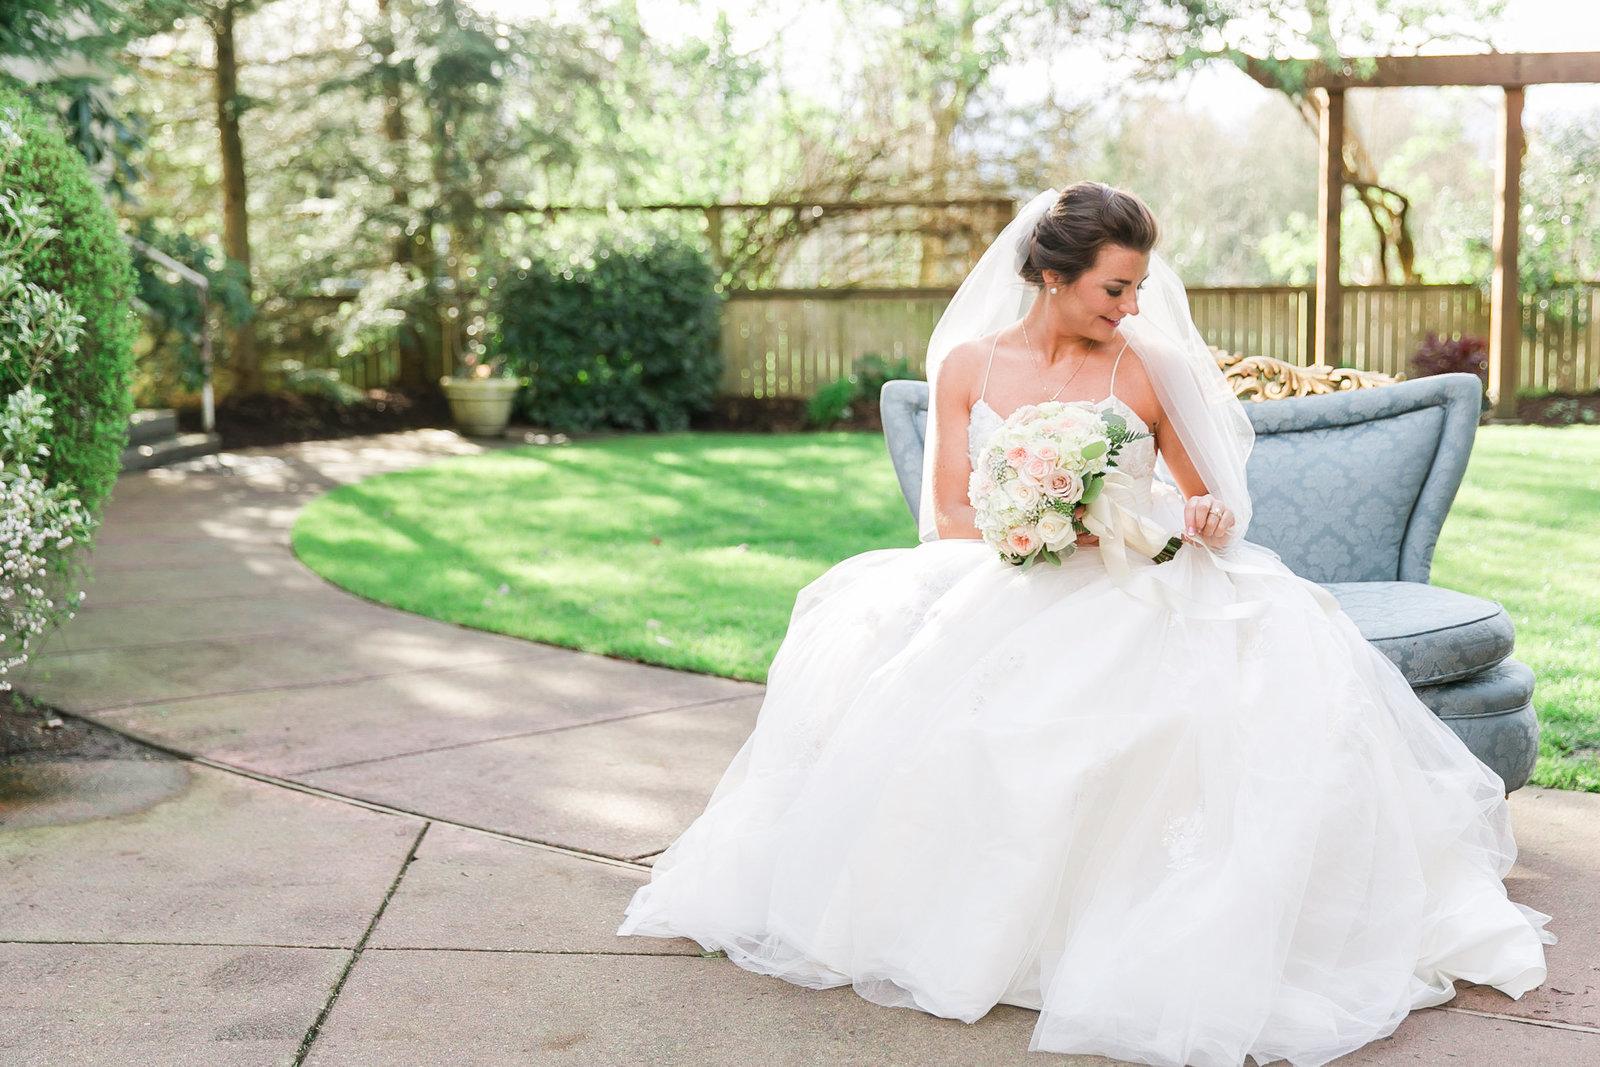 jillian-martin-wedding453394